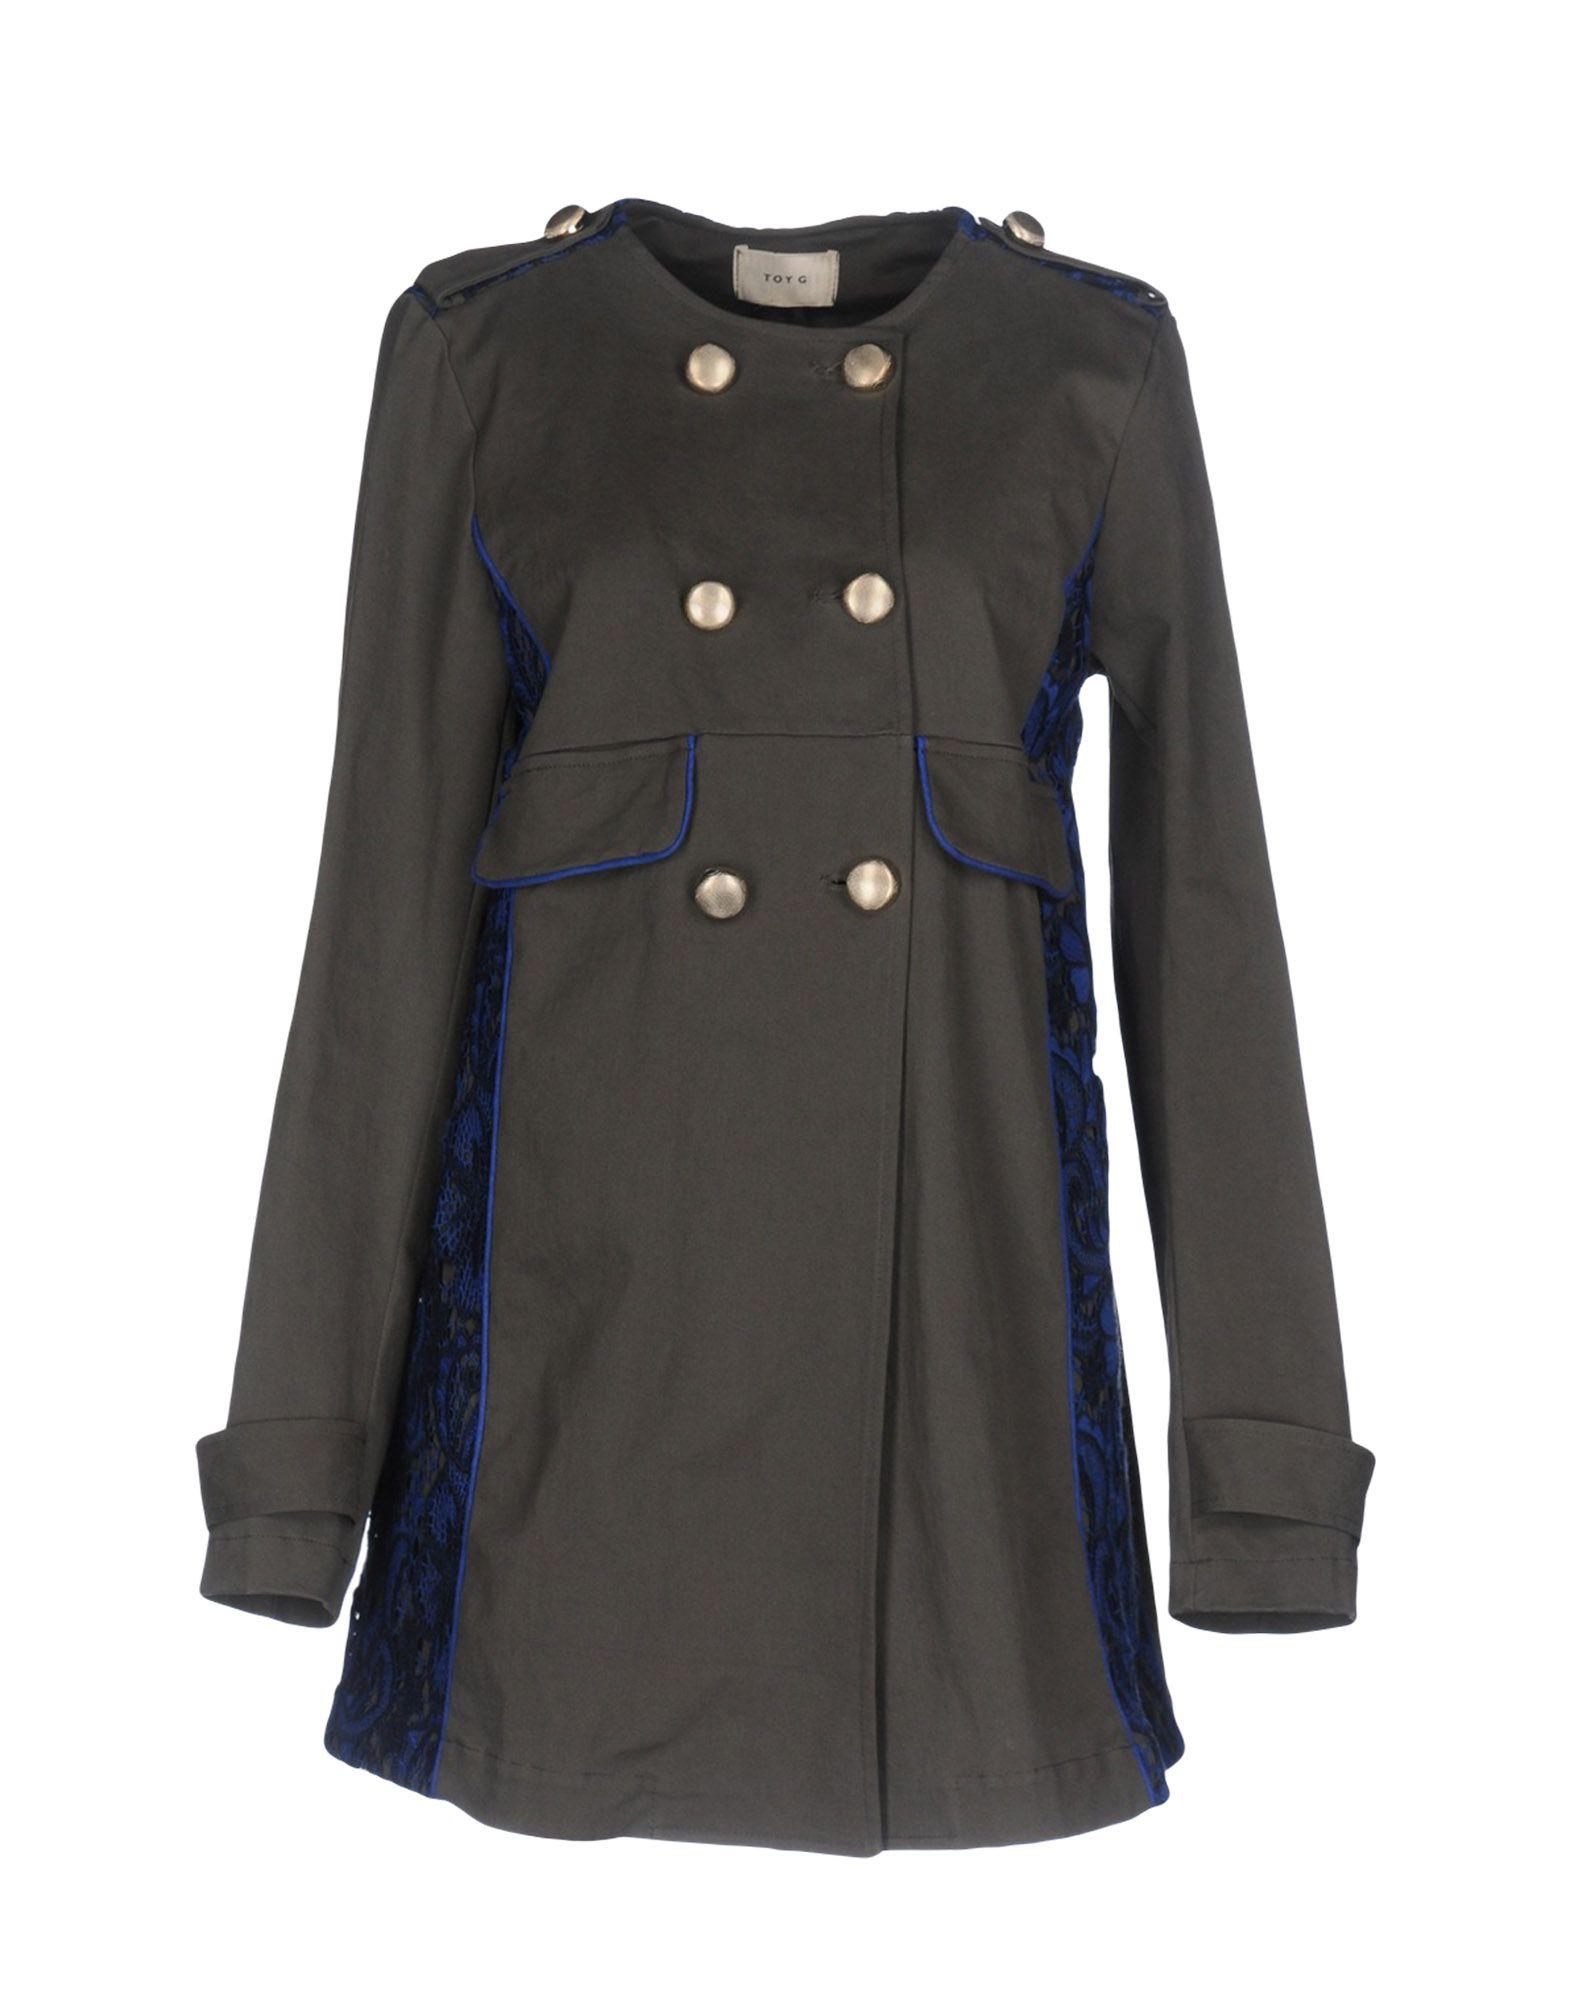 TOY G. Легкое пальто mresale легкое пальто